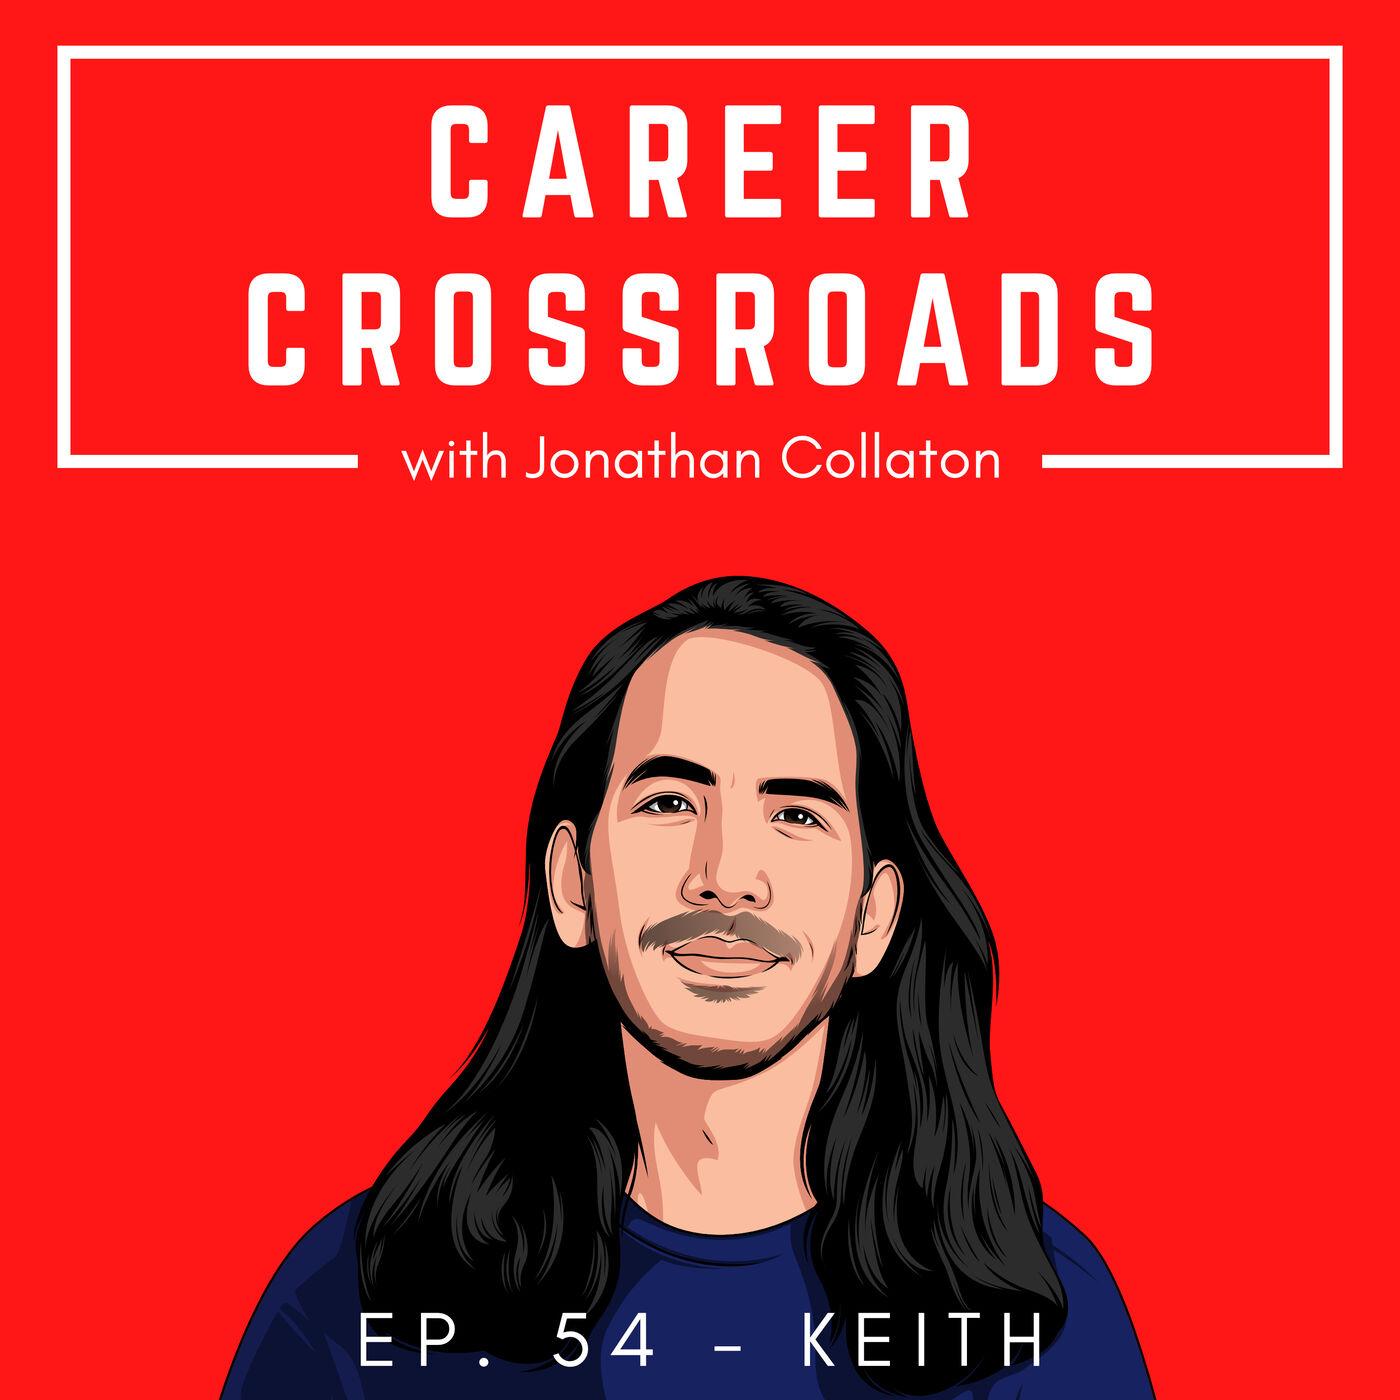 Keith - Opera Singer to Coffee Cocktail Artisan